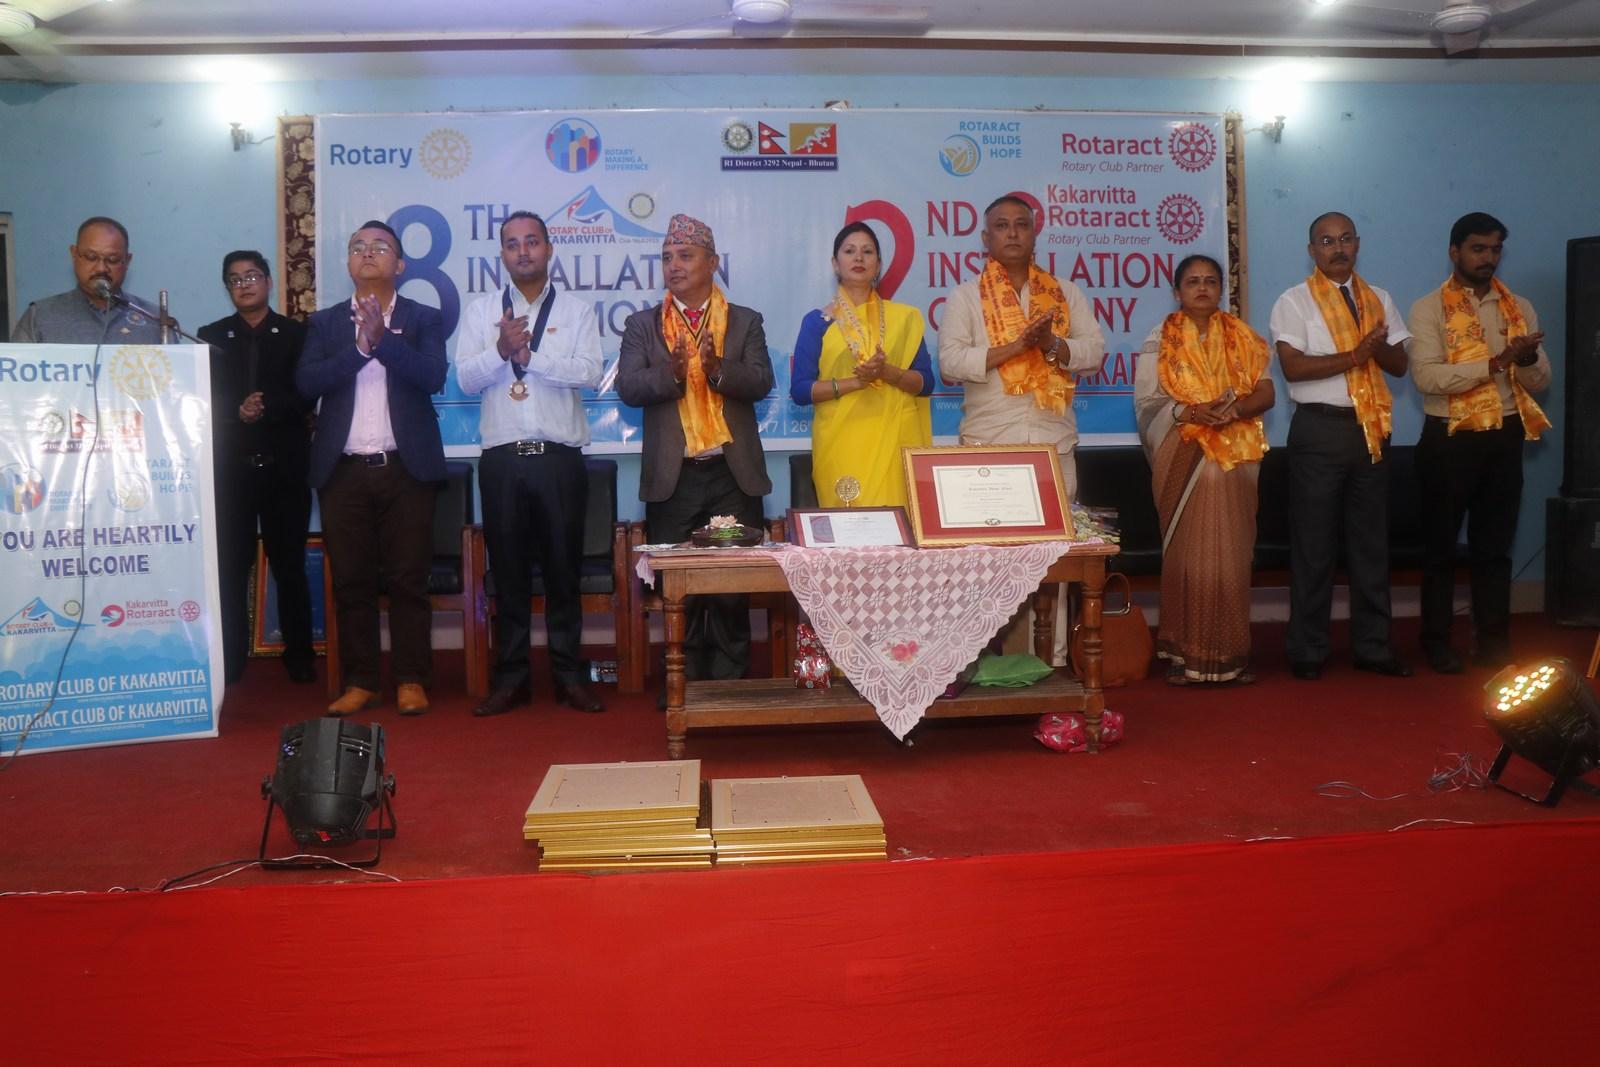 8th-Installation-Ceremony-Rotary-Club-of-Kakarvitta-113